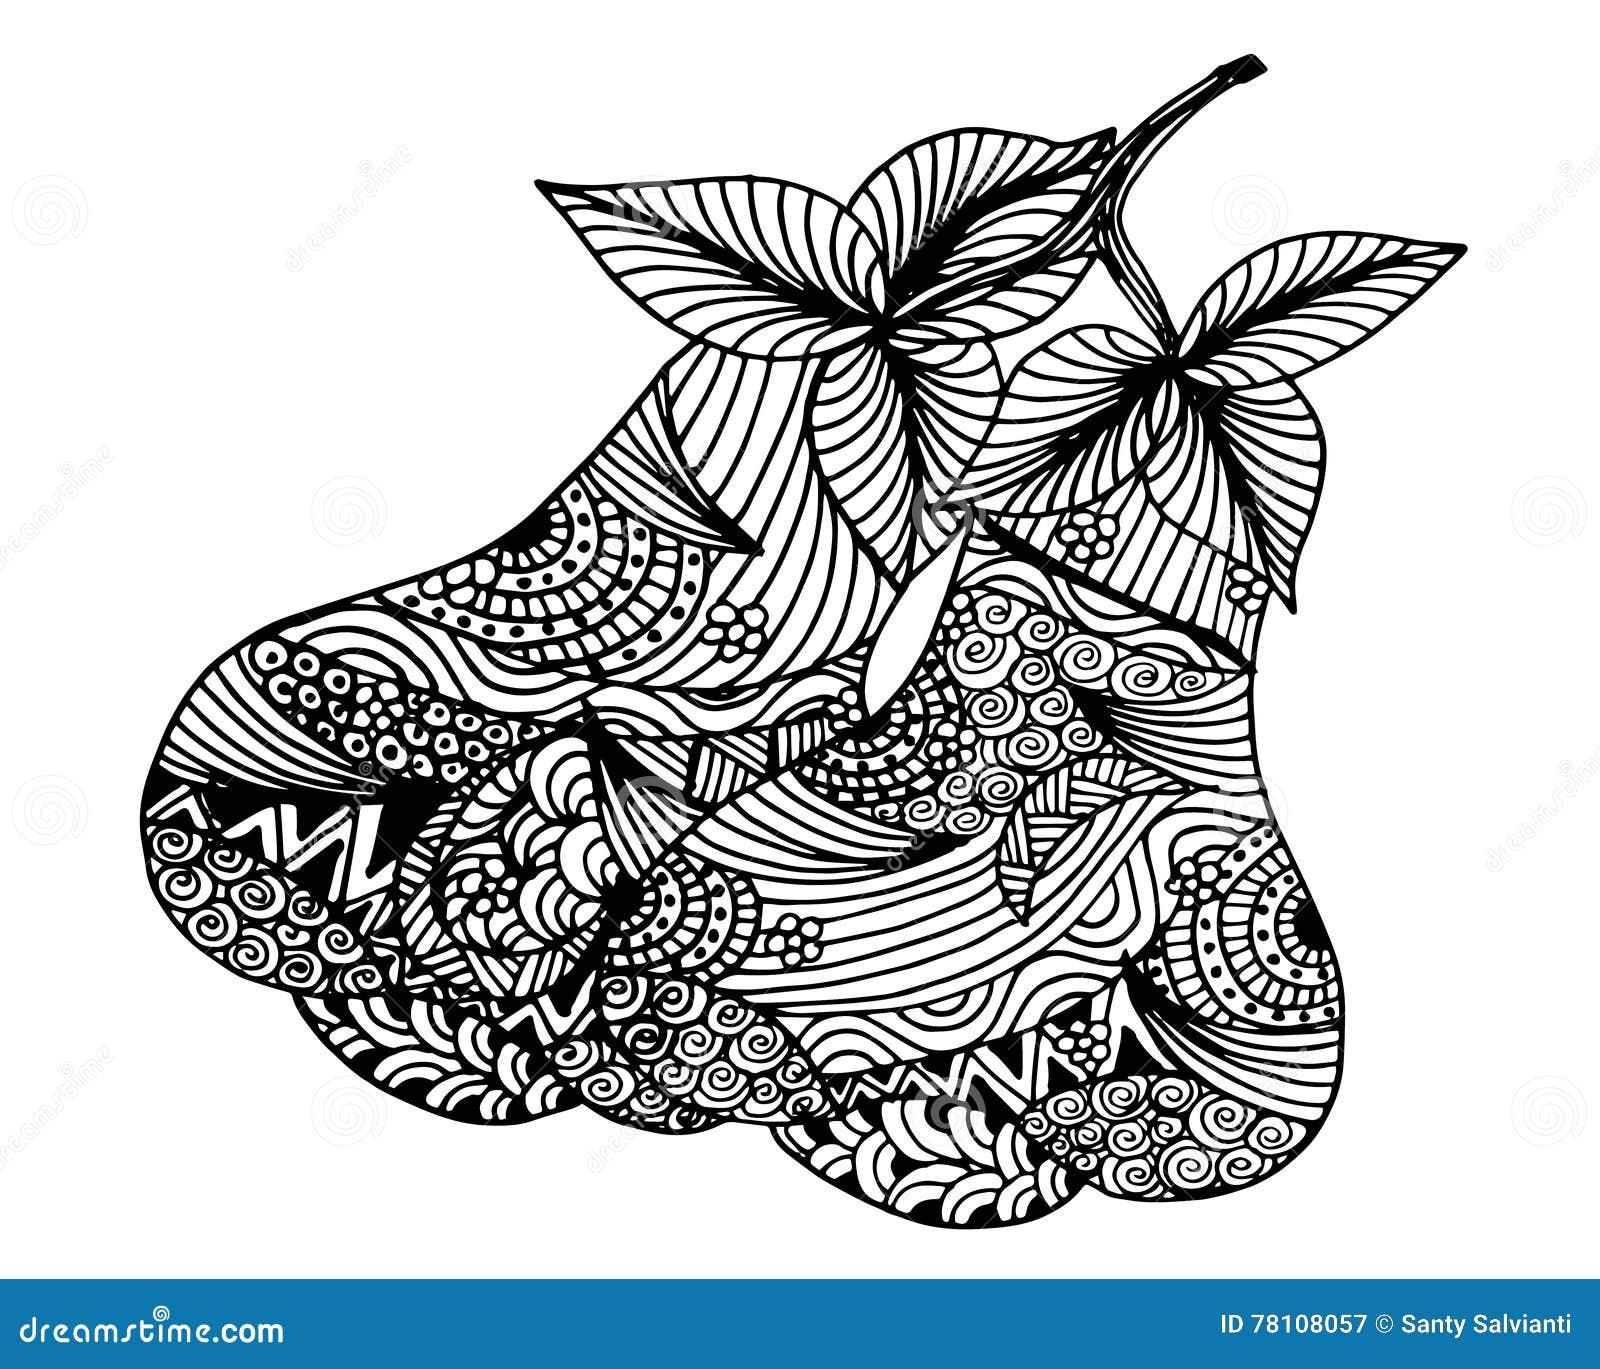 Hand Drawn Rose Apple Fruit Doodle Illustration Stock Illustration